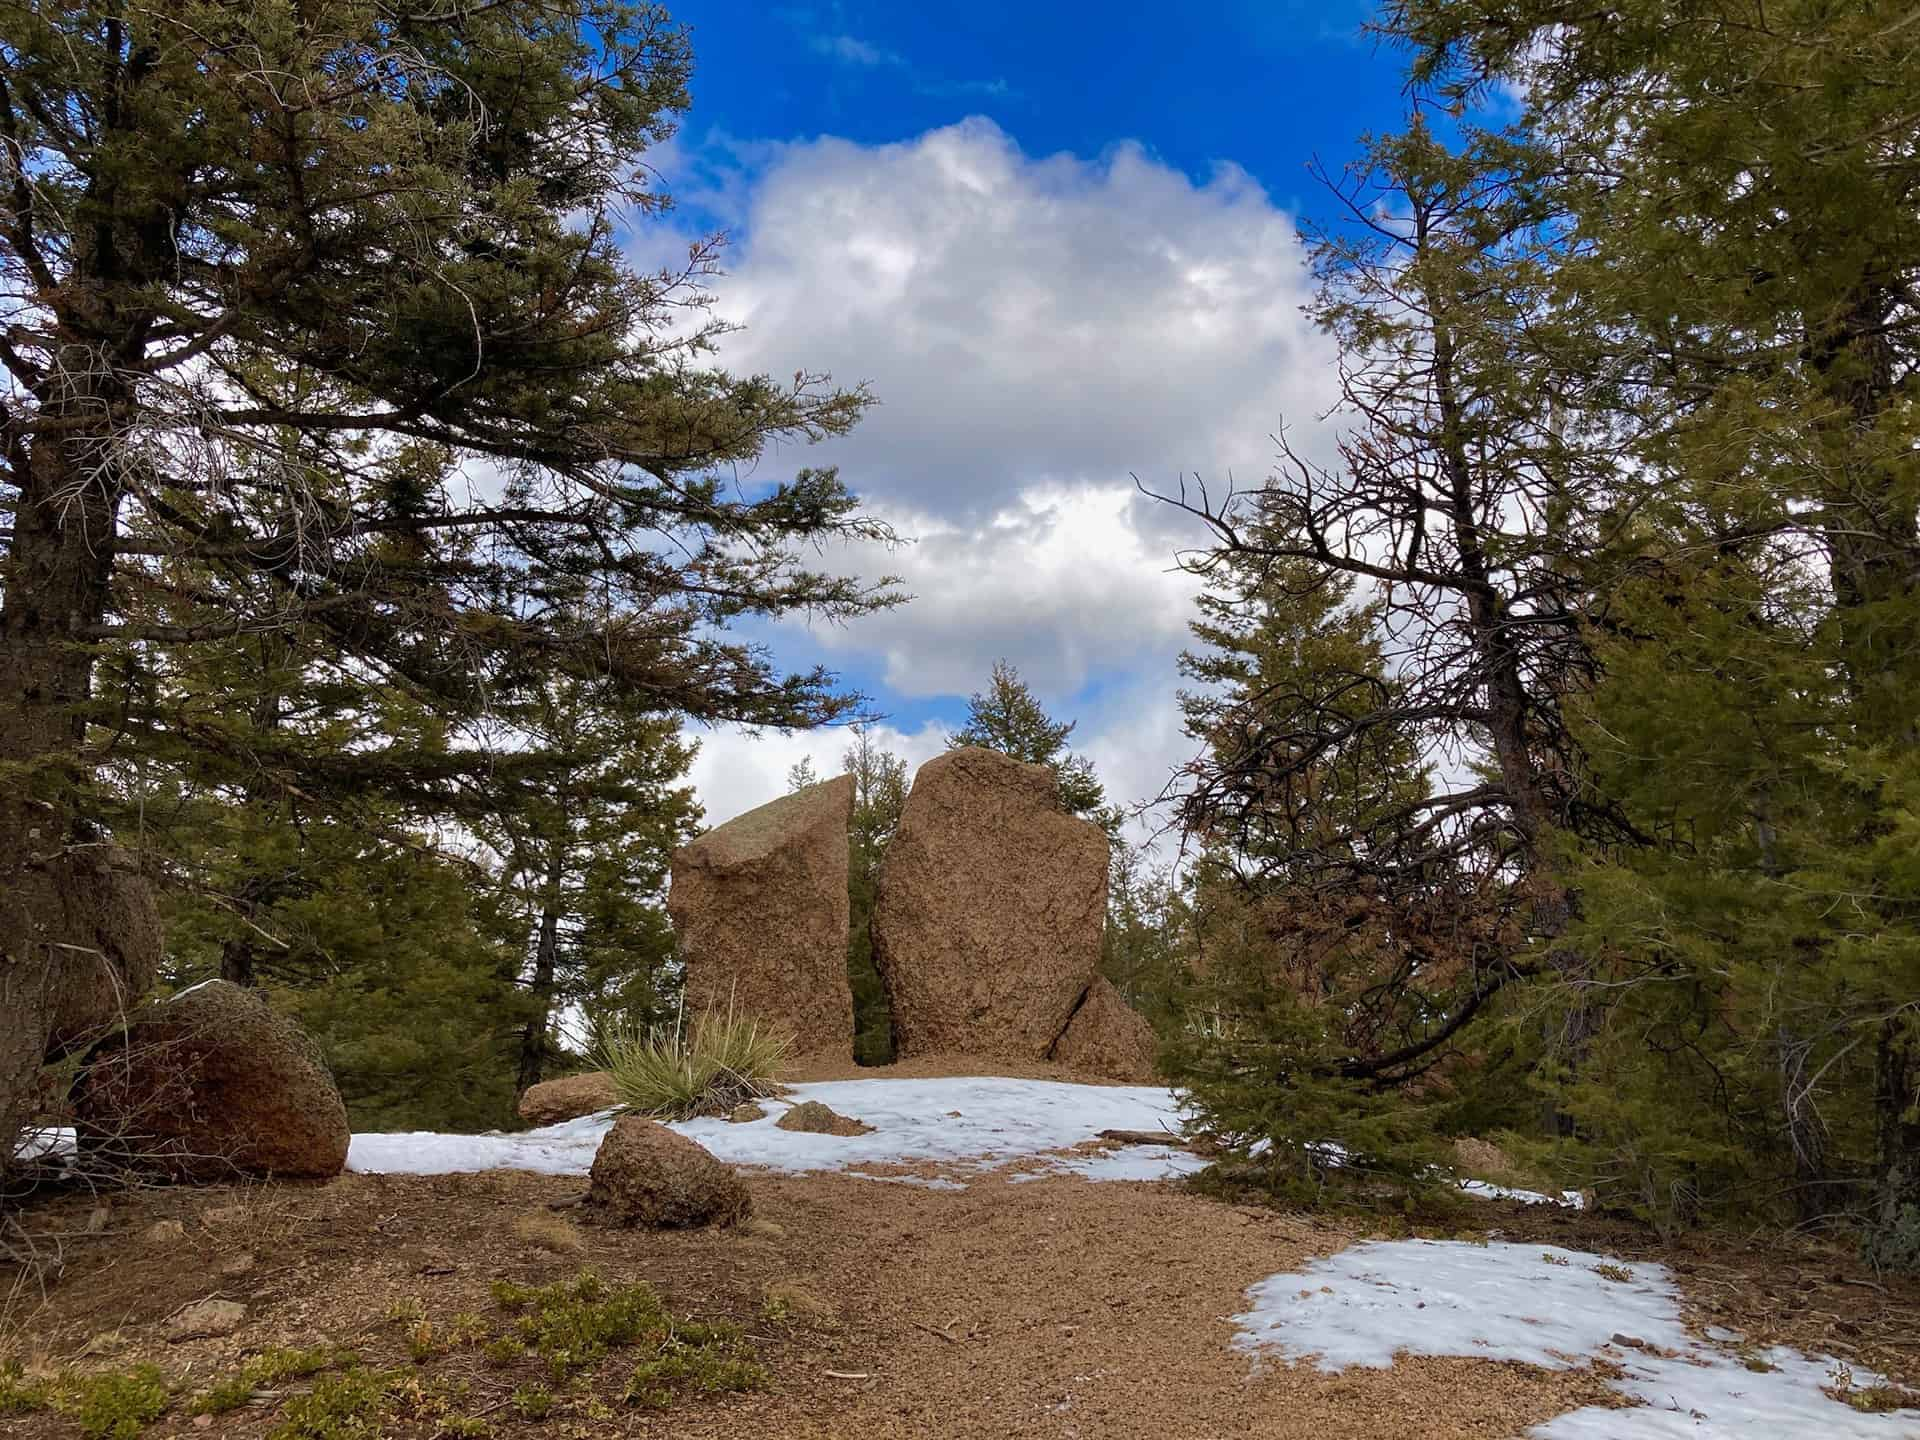 rock formation mount buckhorn